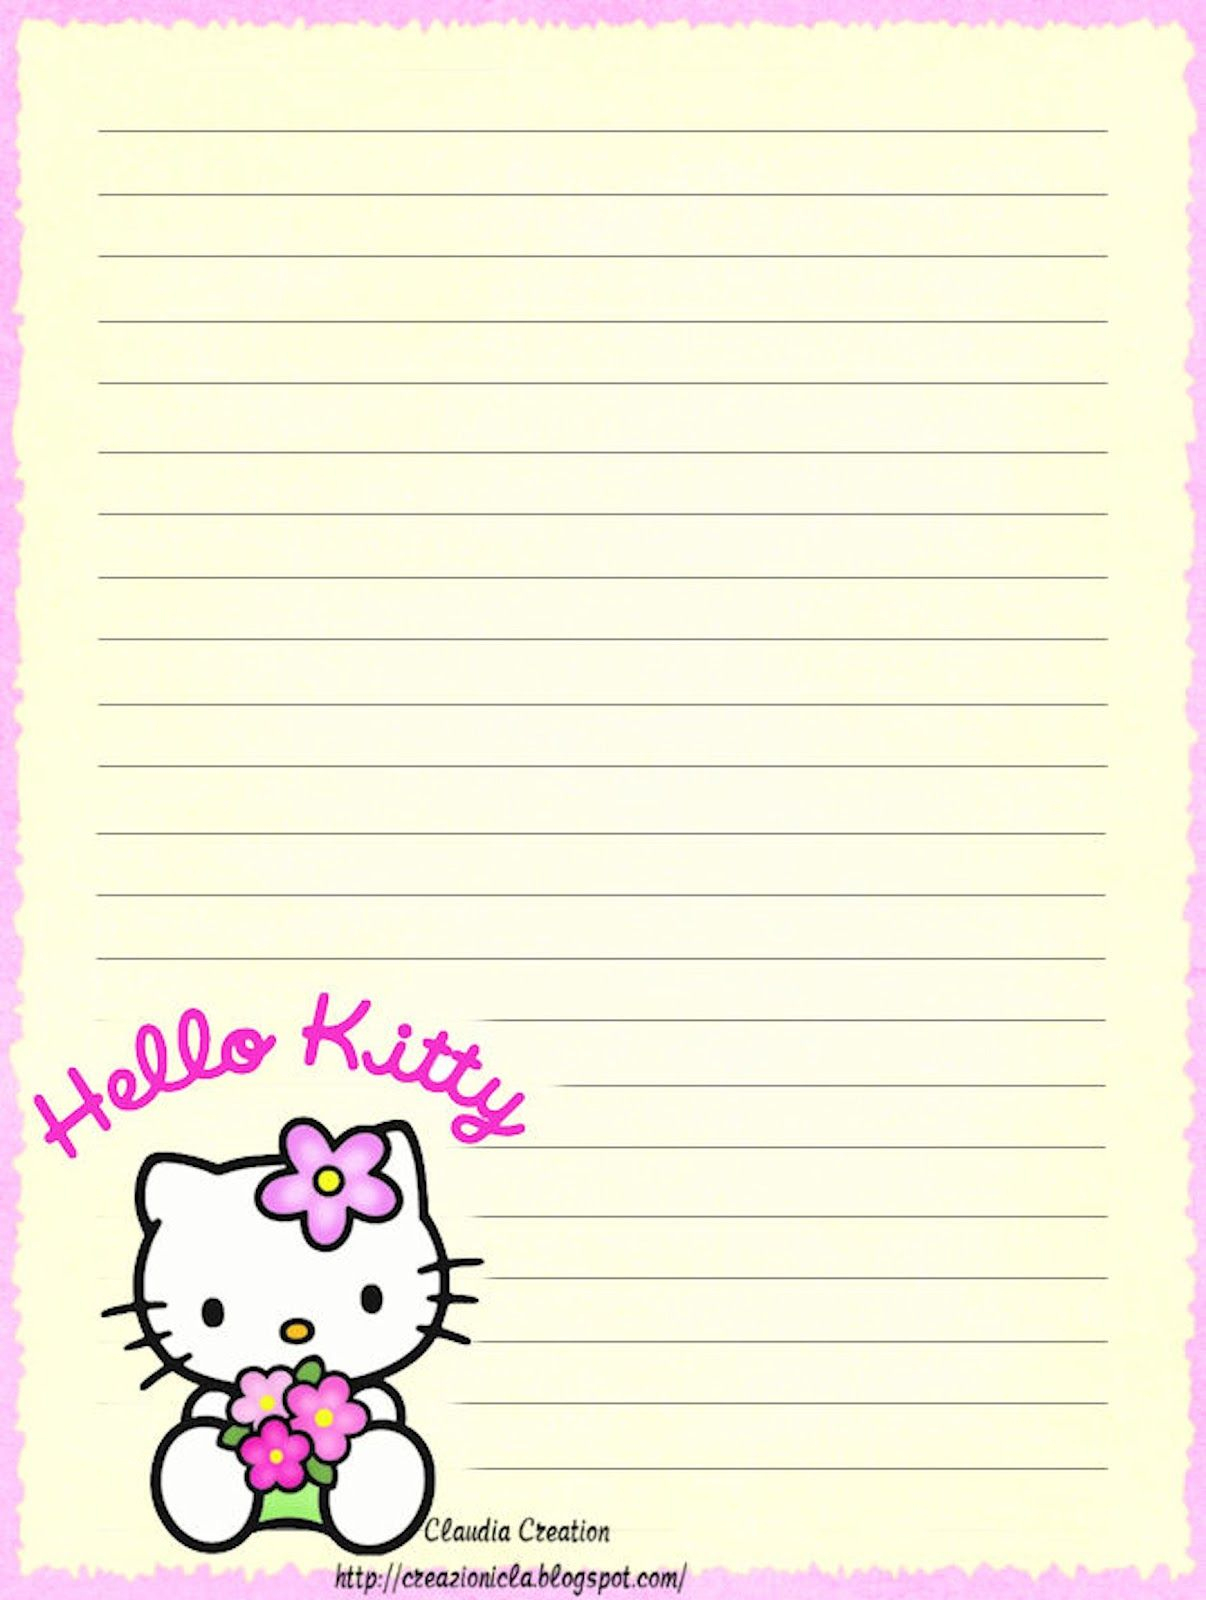 Hello Kitty | Borders,stationary,backgrounds | Pinterest | Hello - Free Printable Hello Kitty Stationery